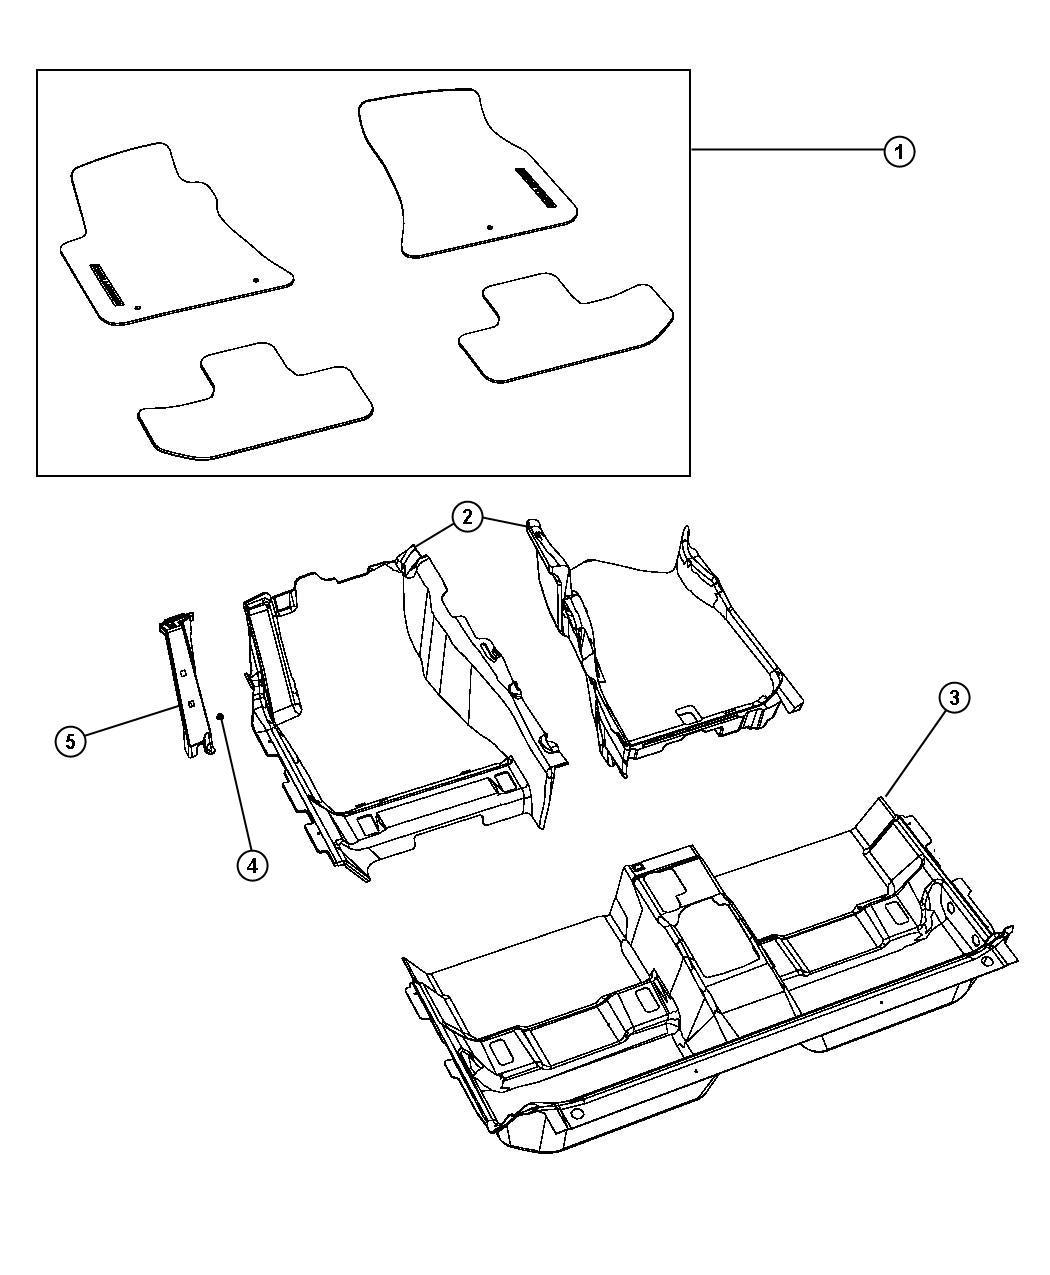 2014 Dodge Challenger Mat kit. Floor. [clz]. Trim: (*o0